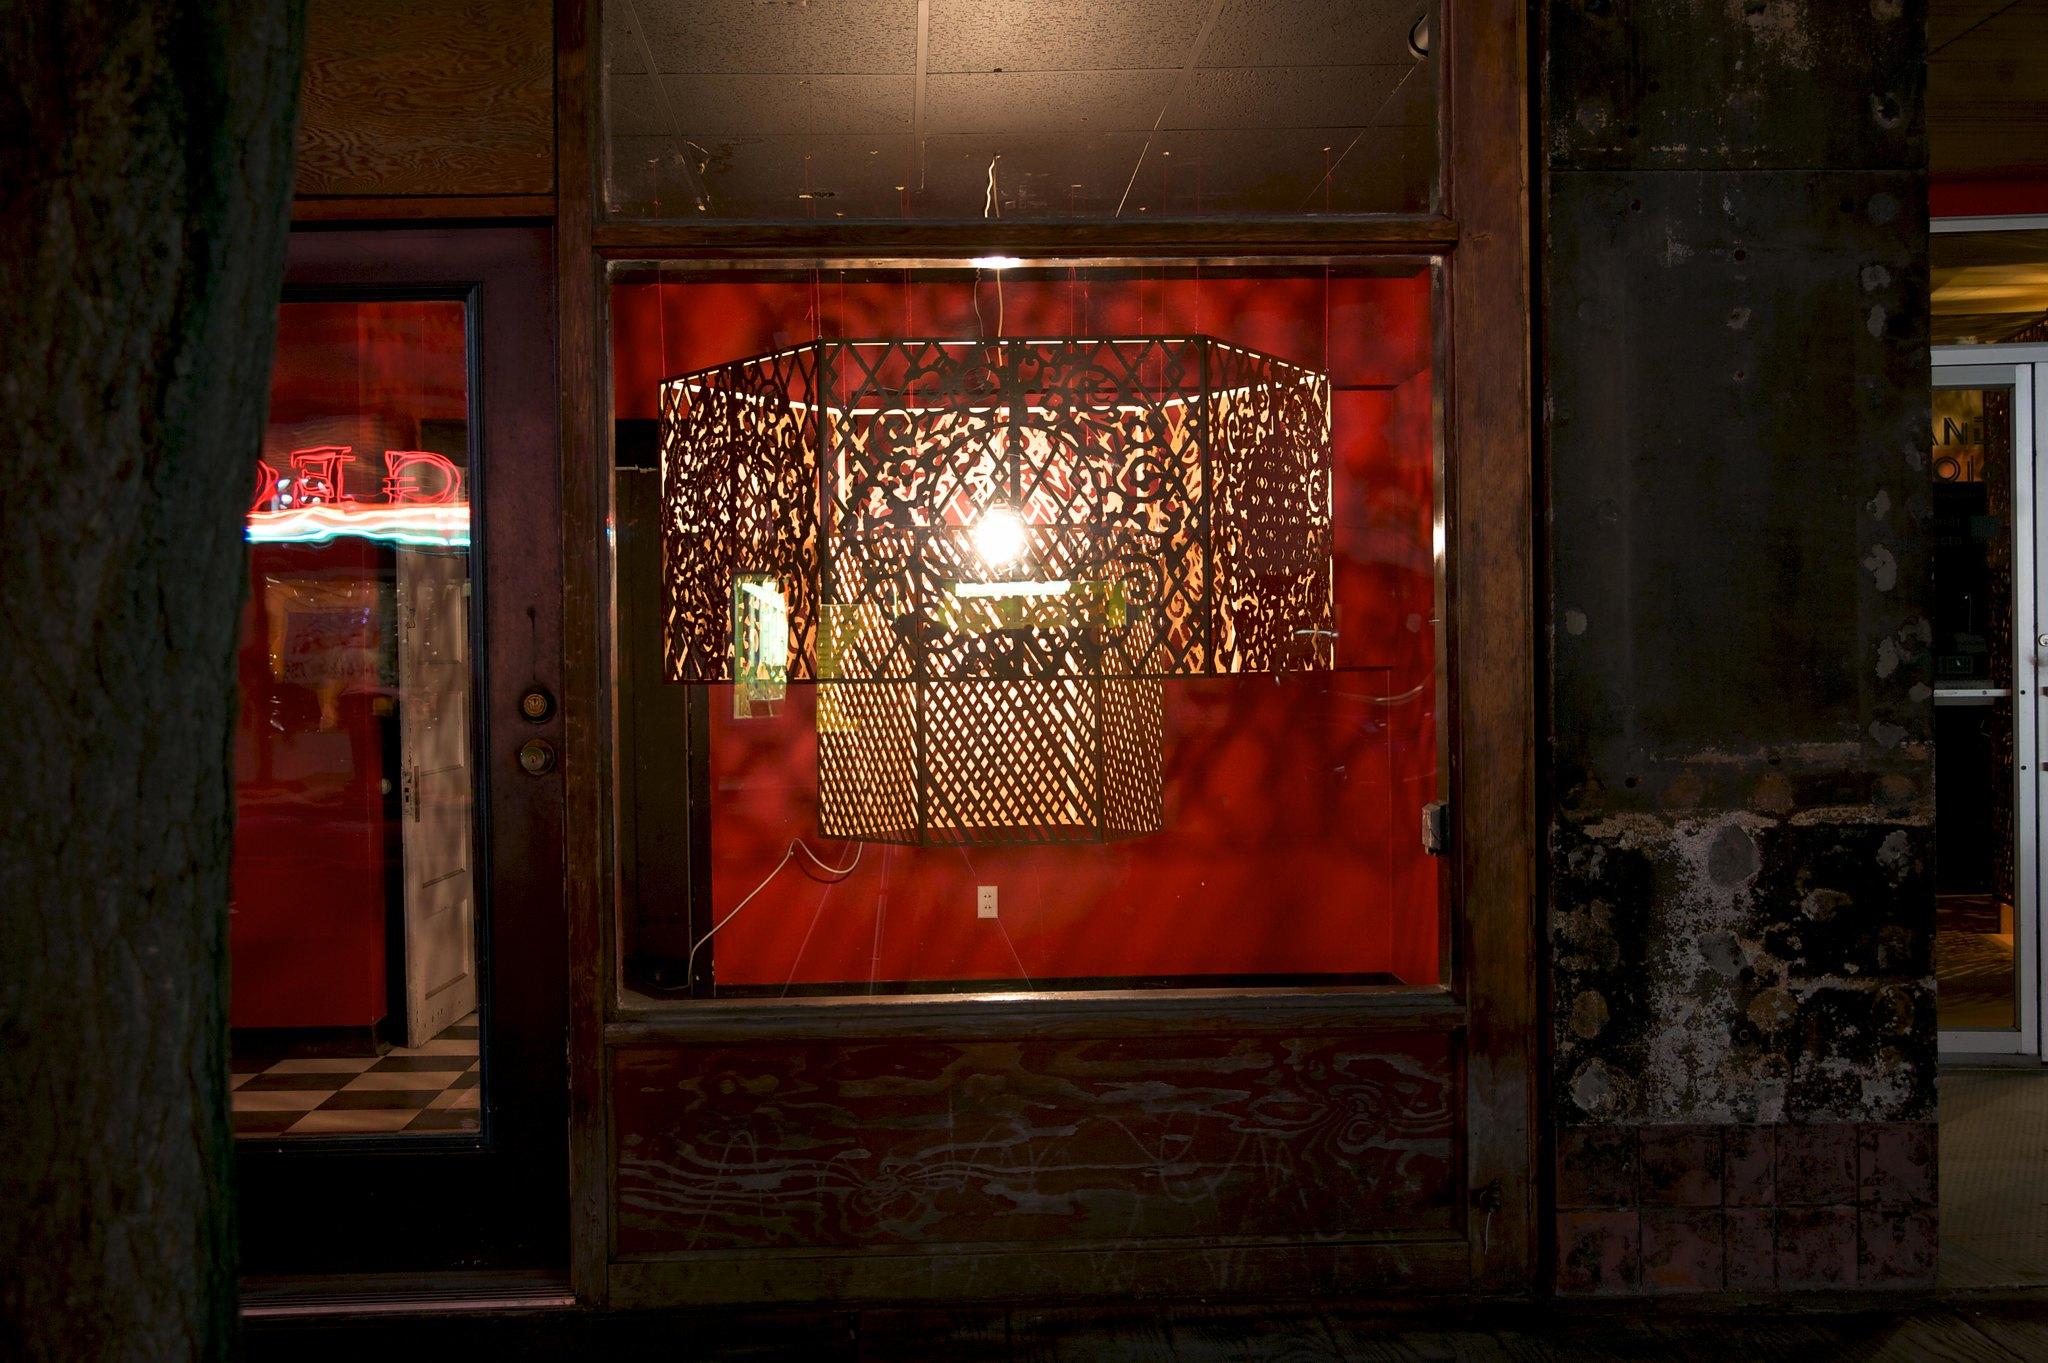 Charlene Liu  exhibited at The Rivoli Theater, Pendleton